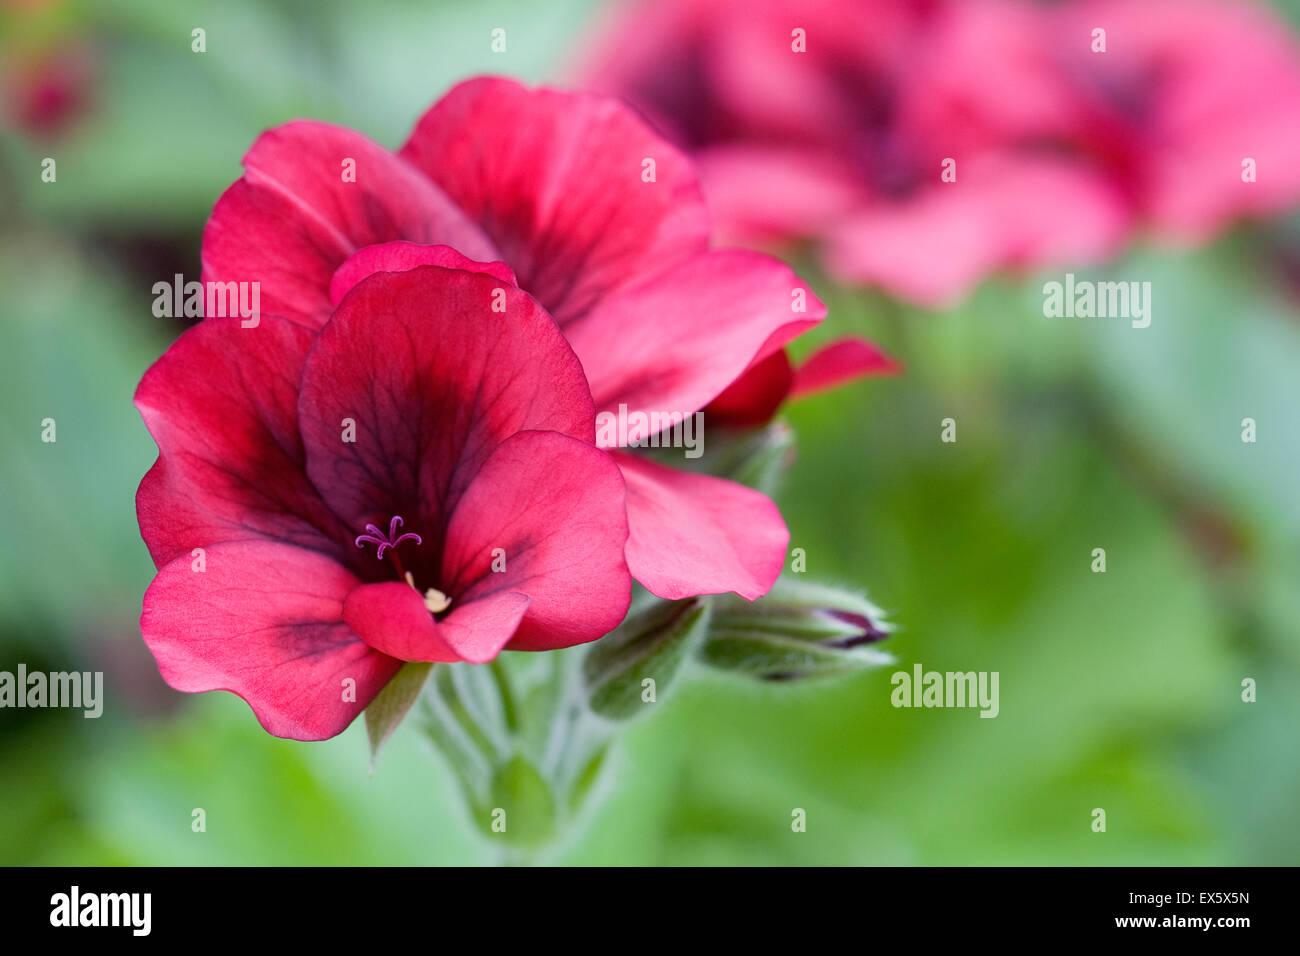 Pelargonium 'Mystery' flower. - Stock Image